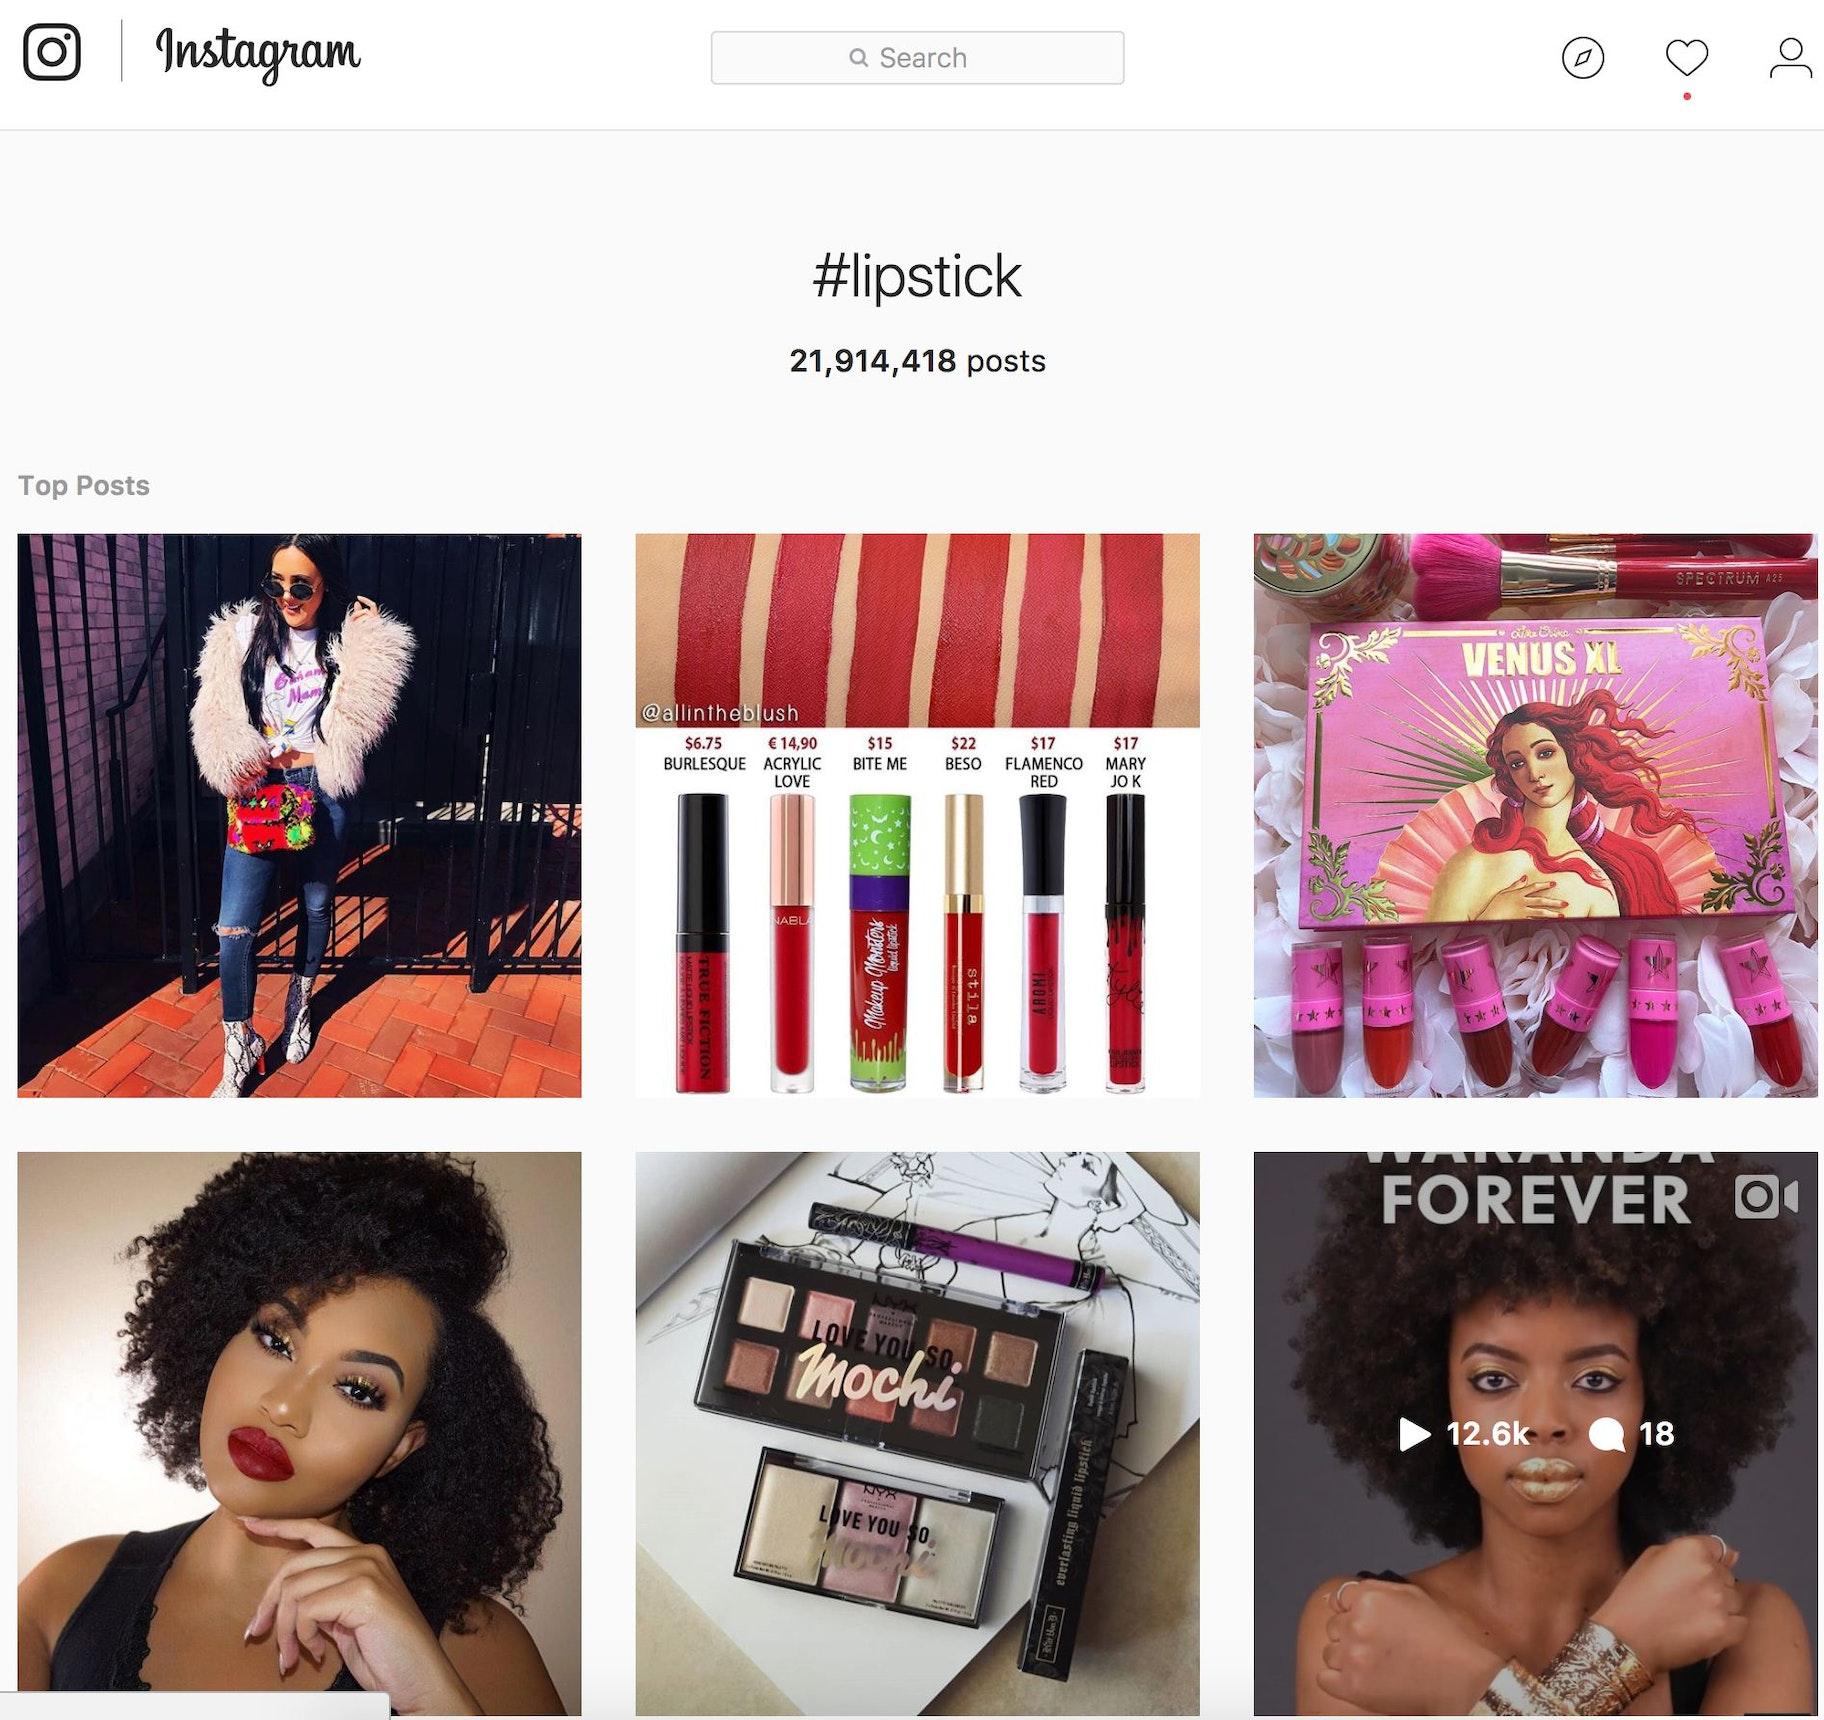 Instagram viral marketing examples